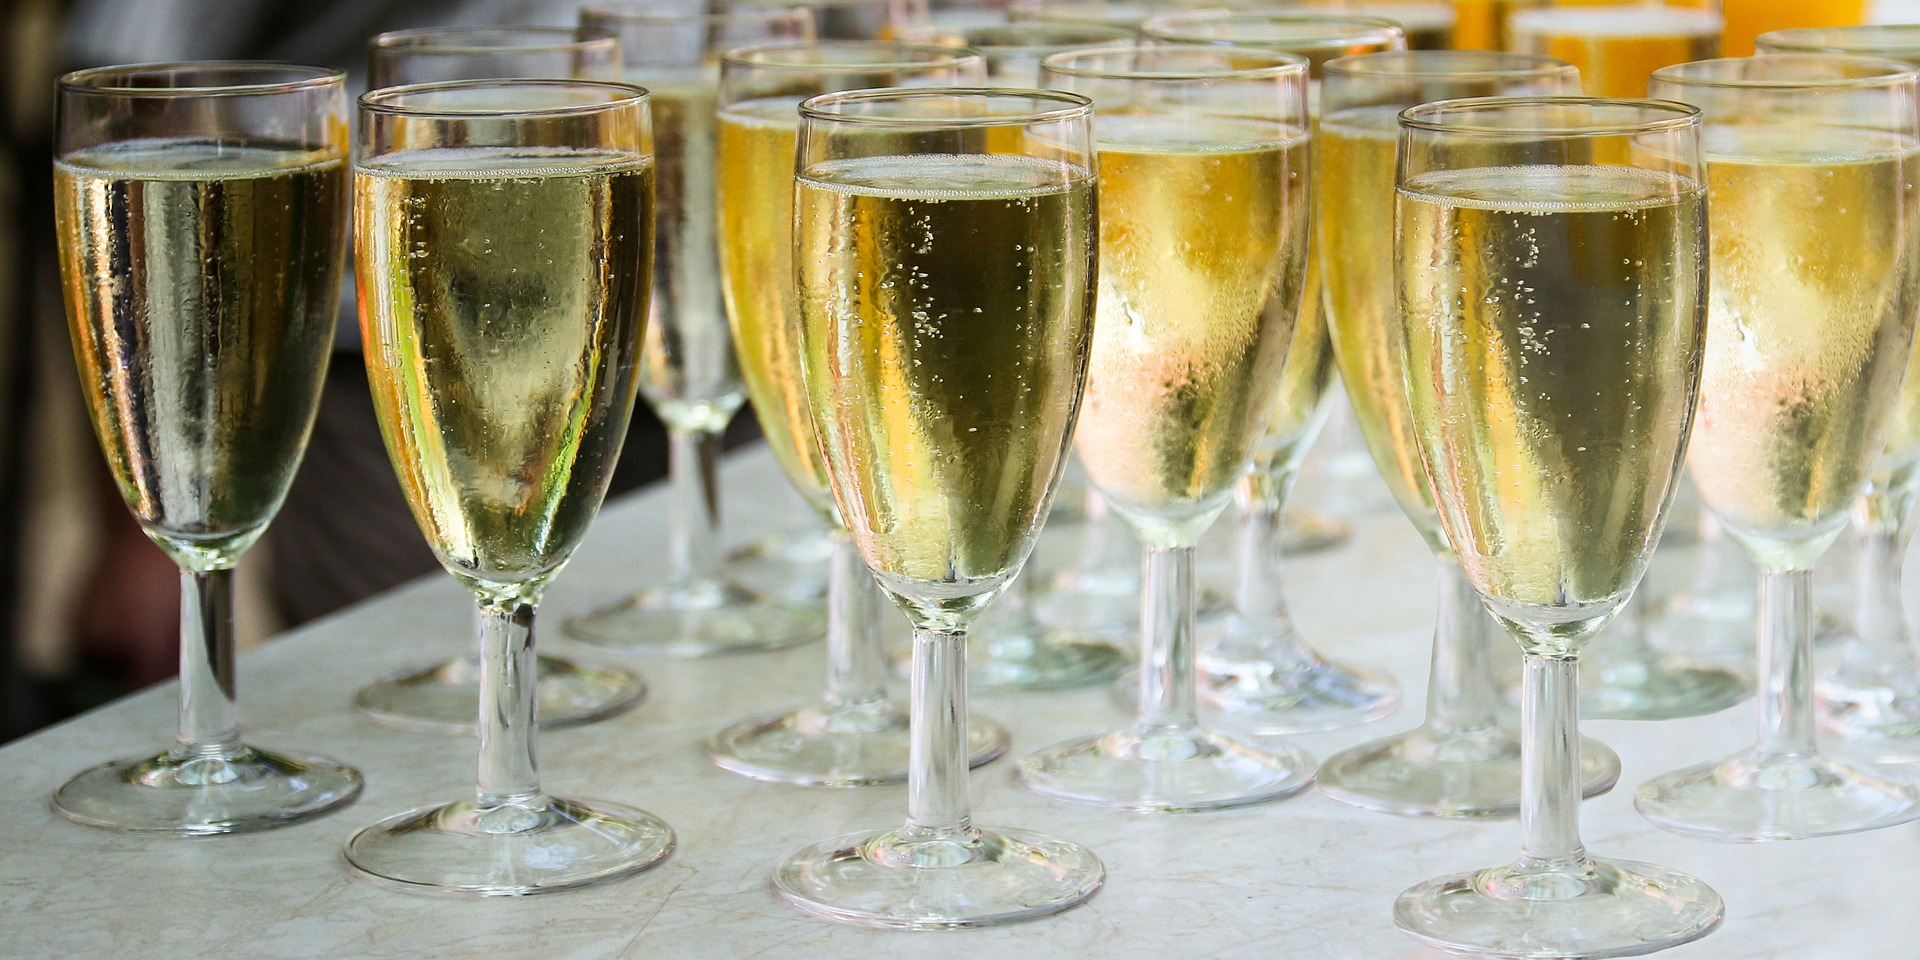 Sparkling Summer liquid refreshments